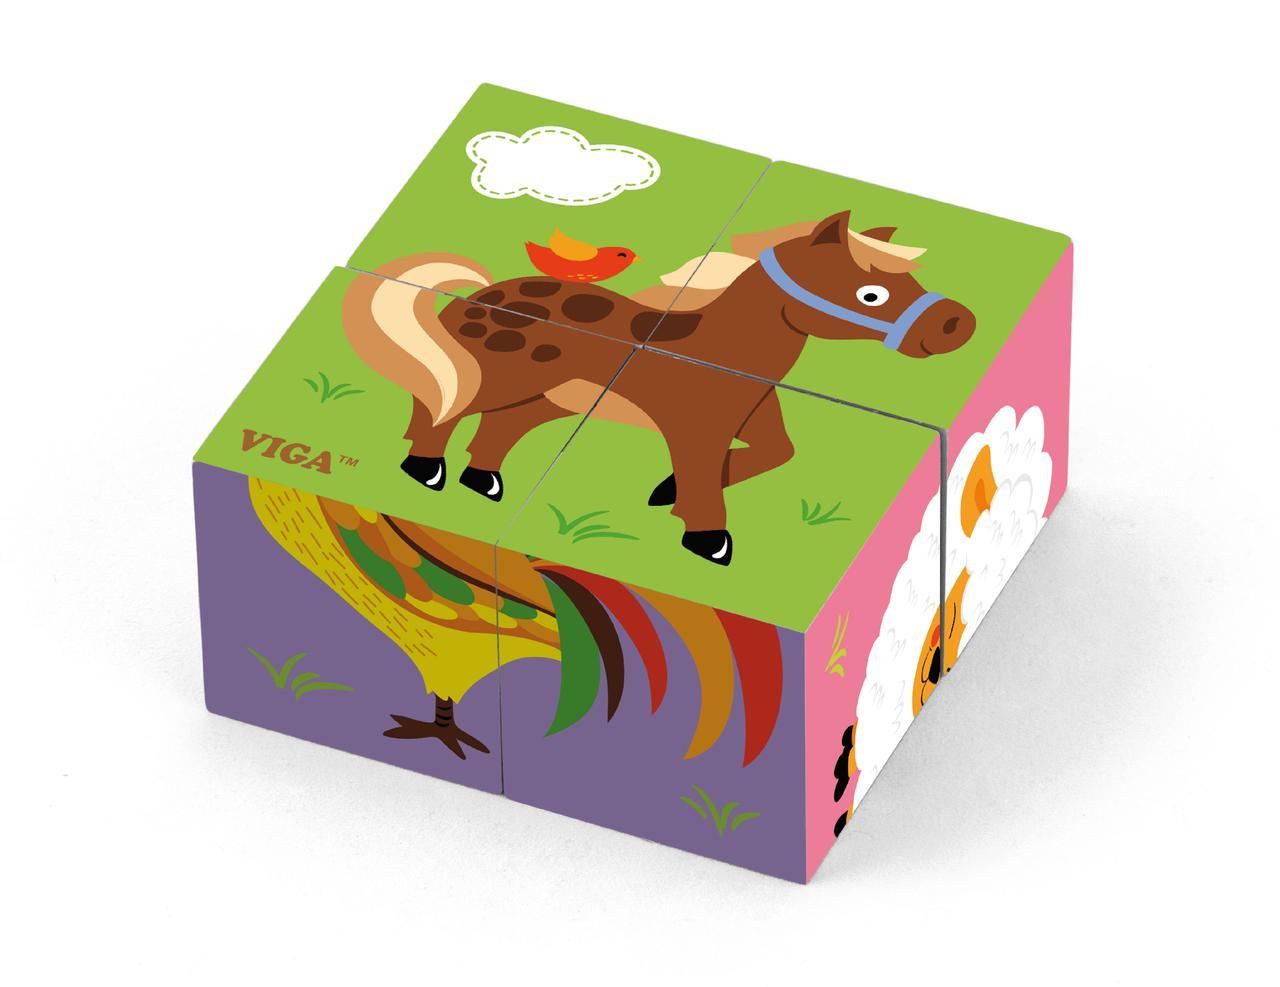 Пазл-кубики Ферма Viga toys (50835)